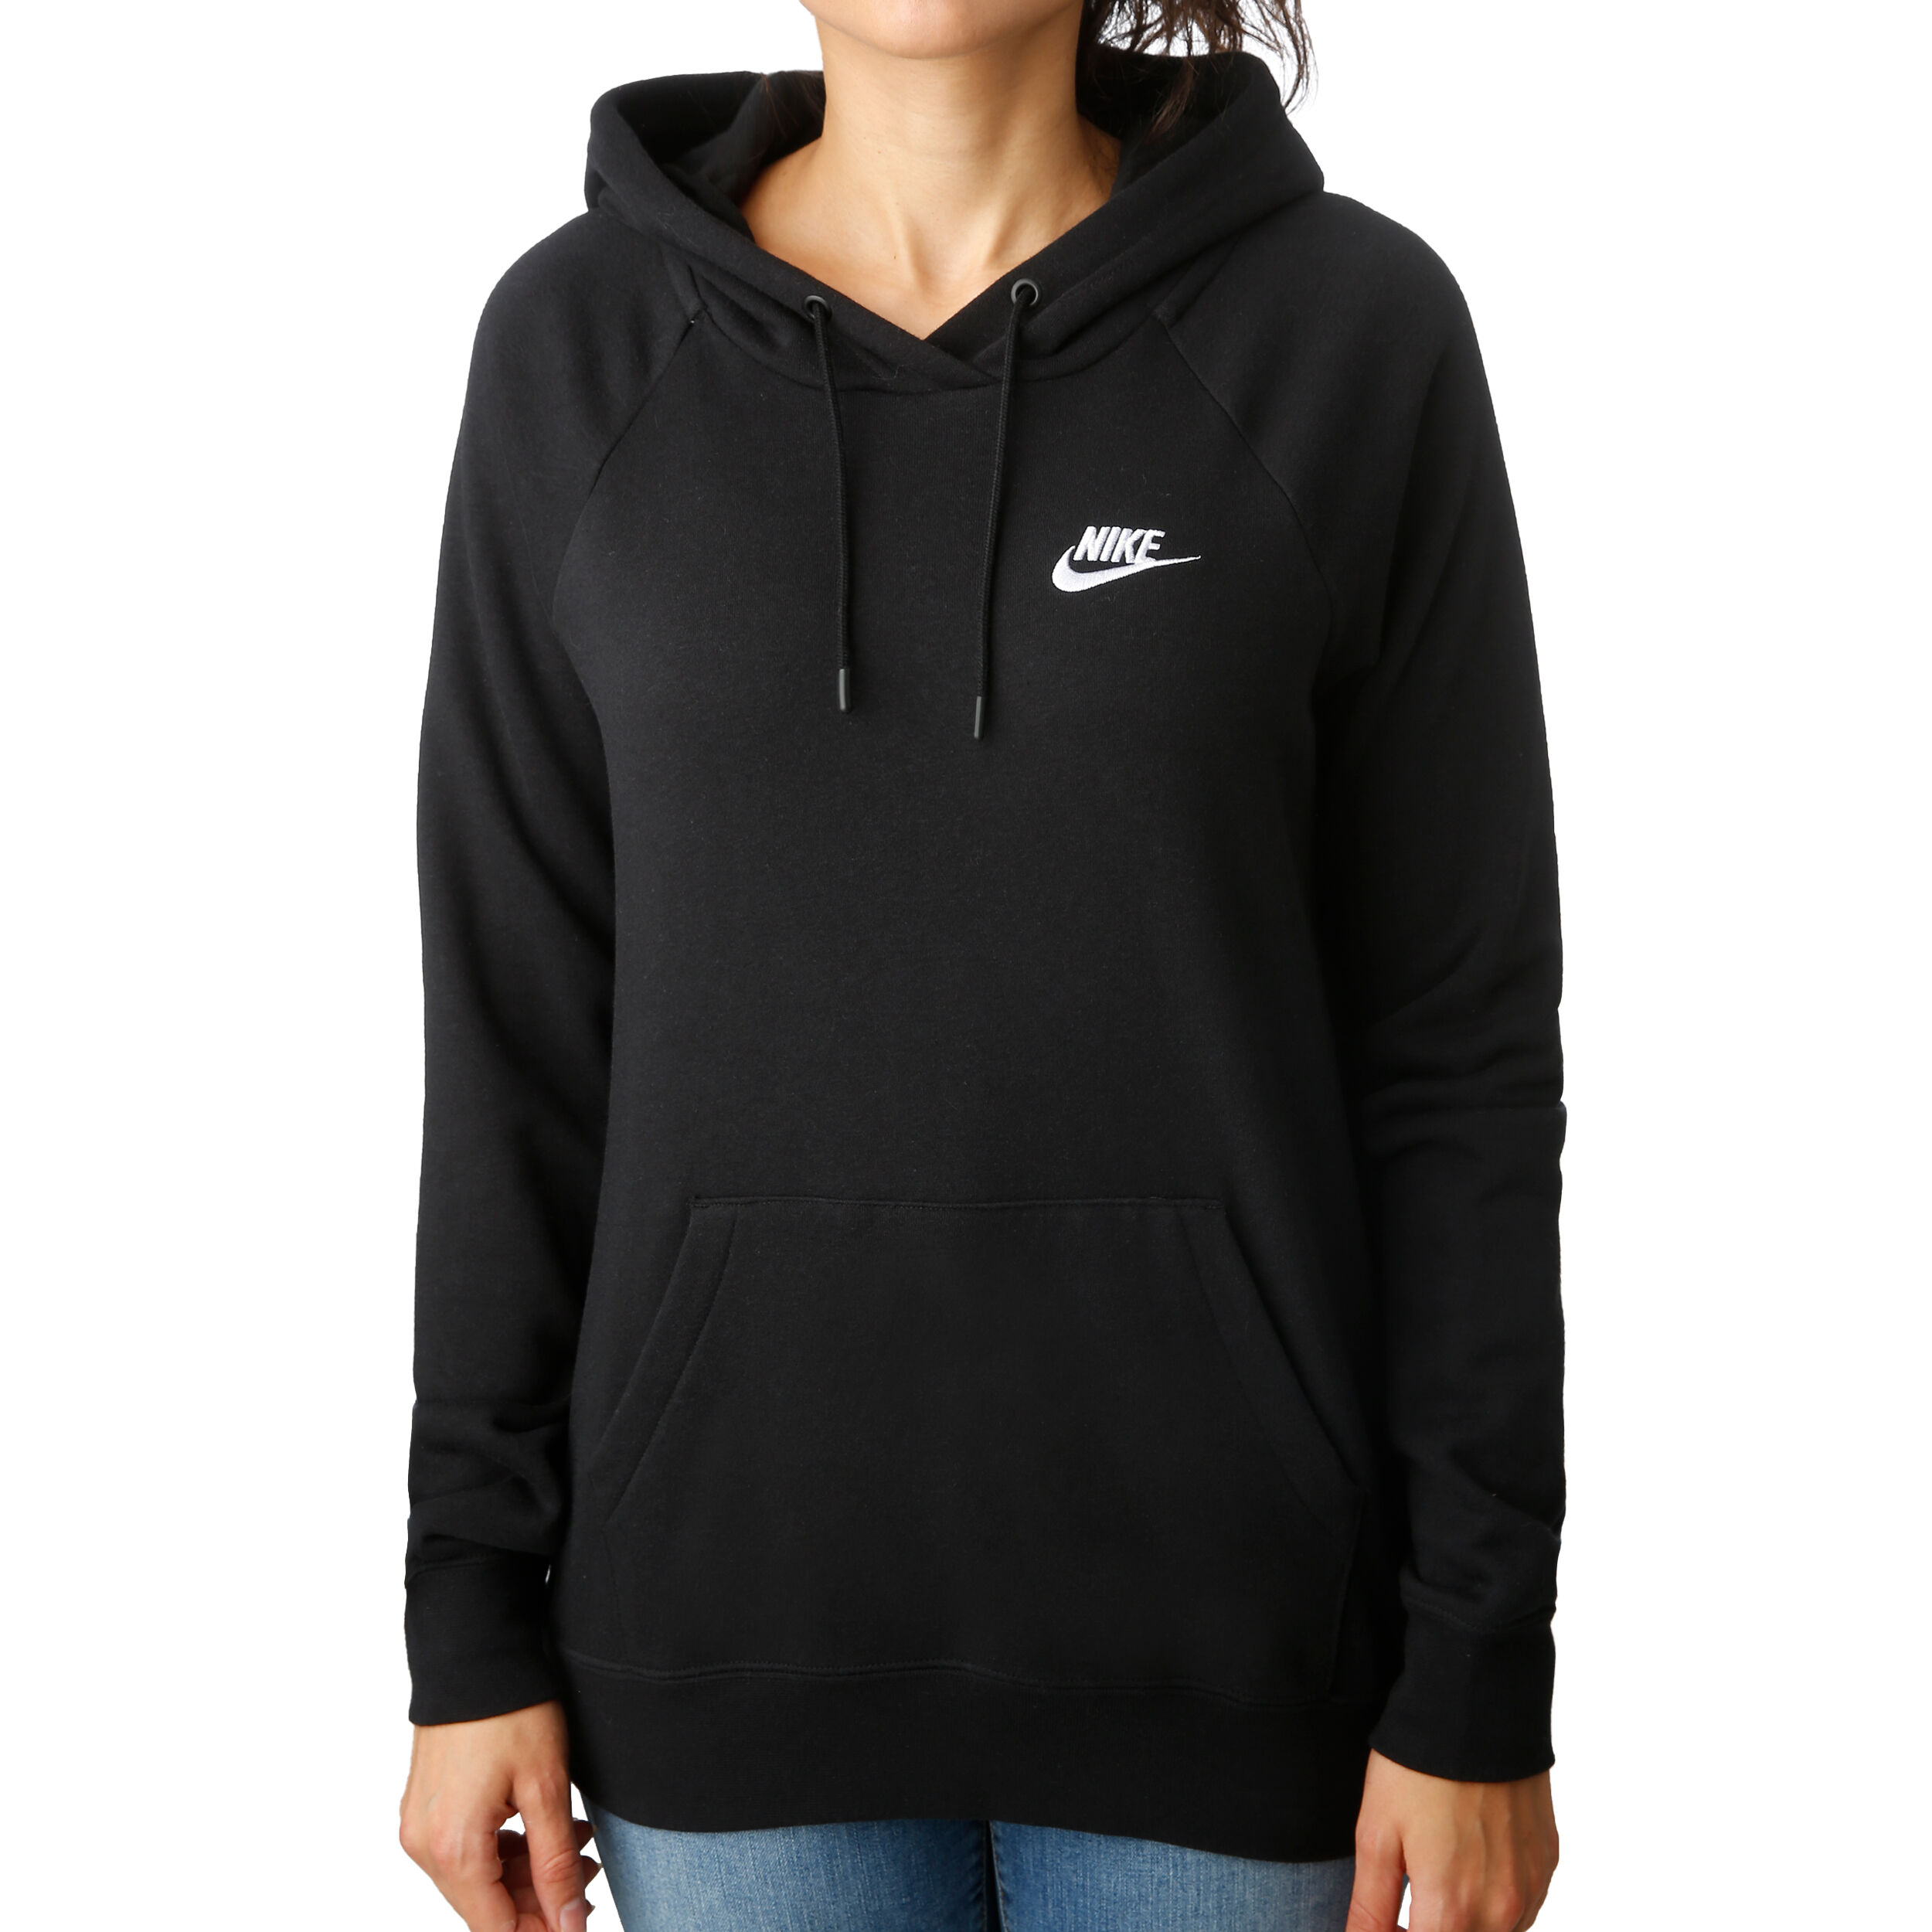 Nike Sportswear Essential Hoody Damen Schwarz, Weiß online